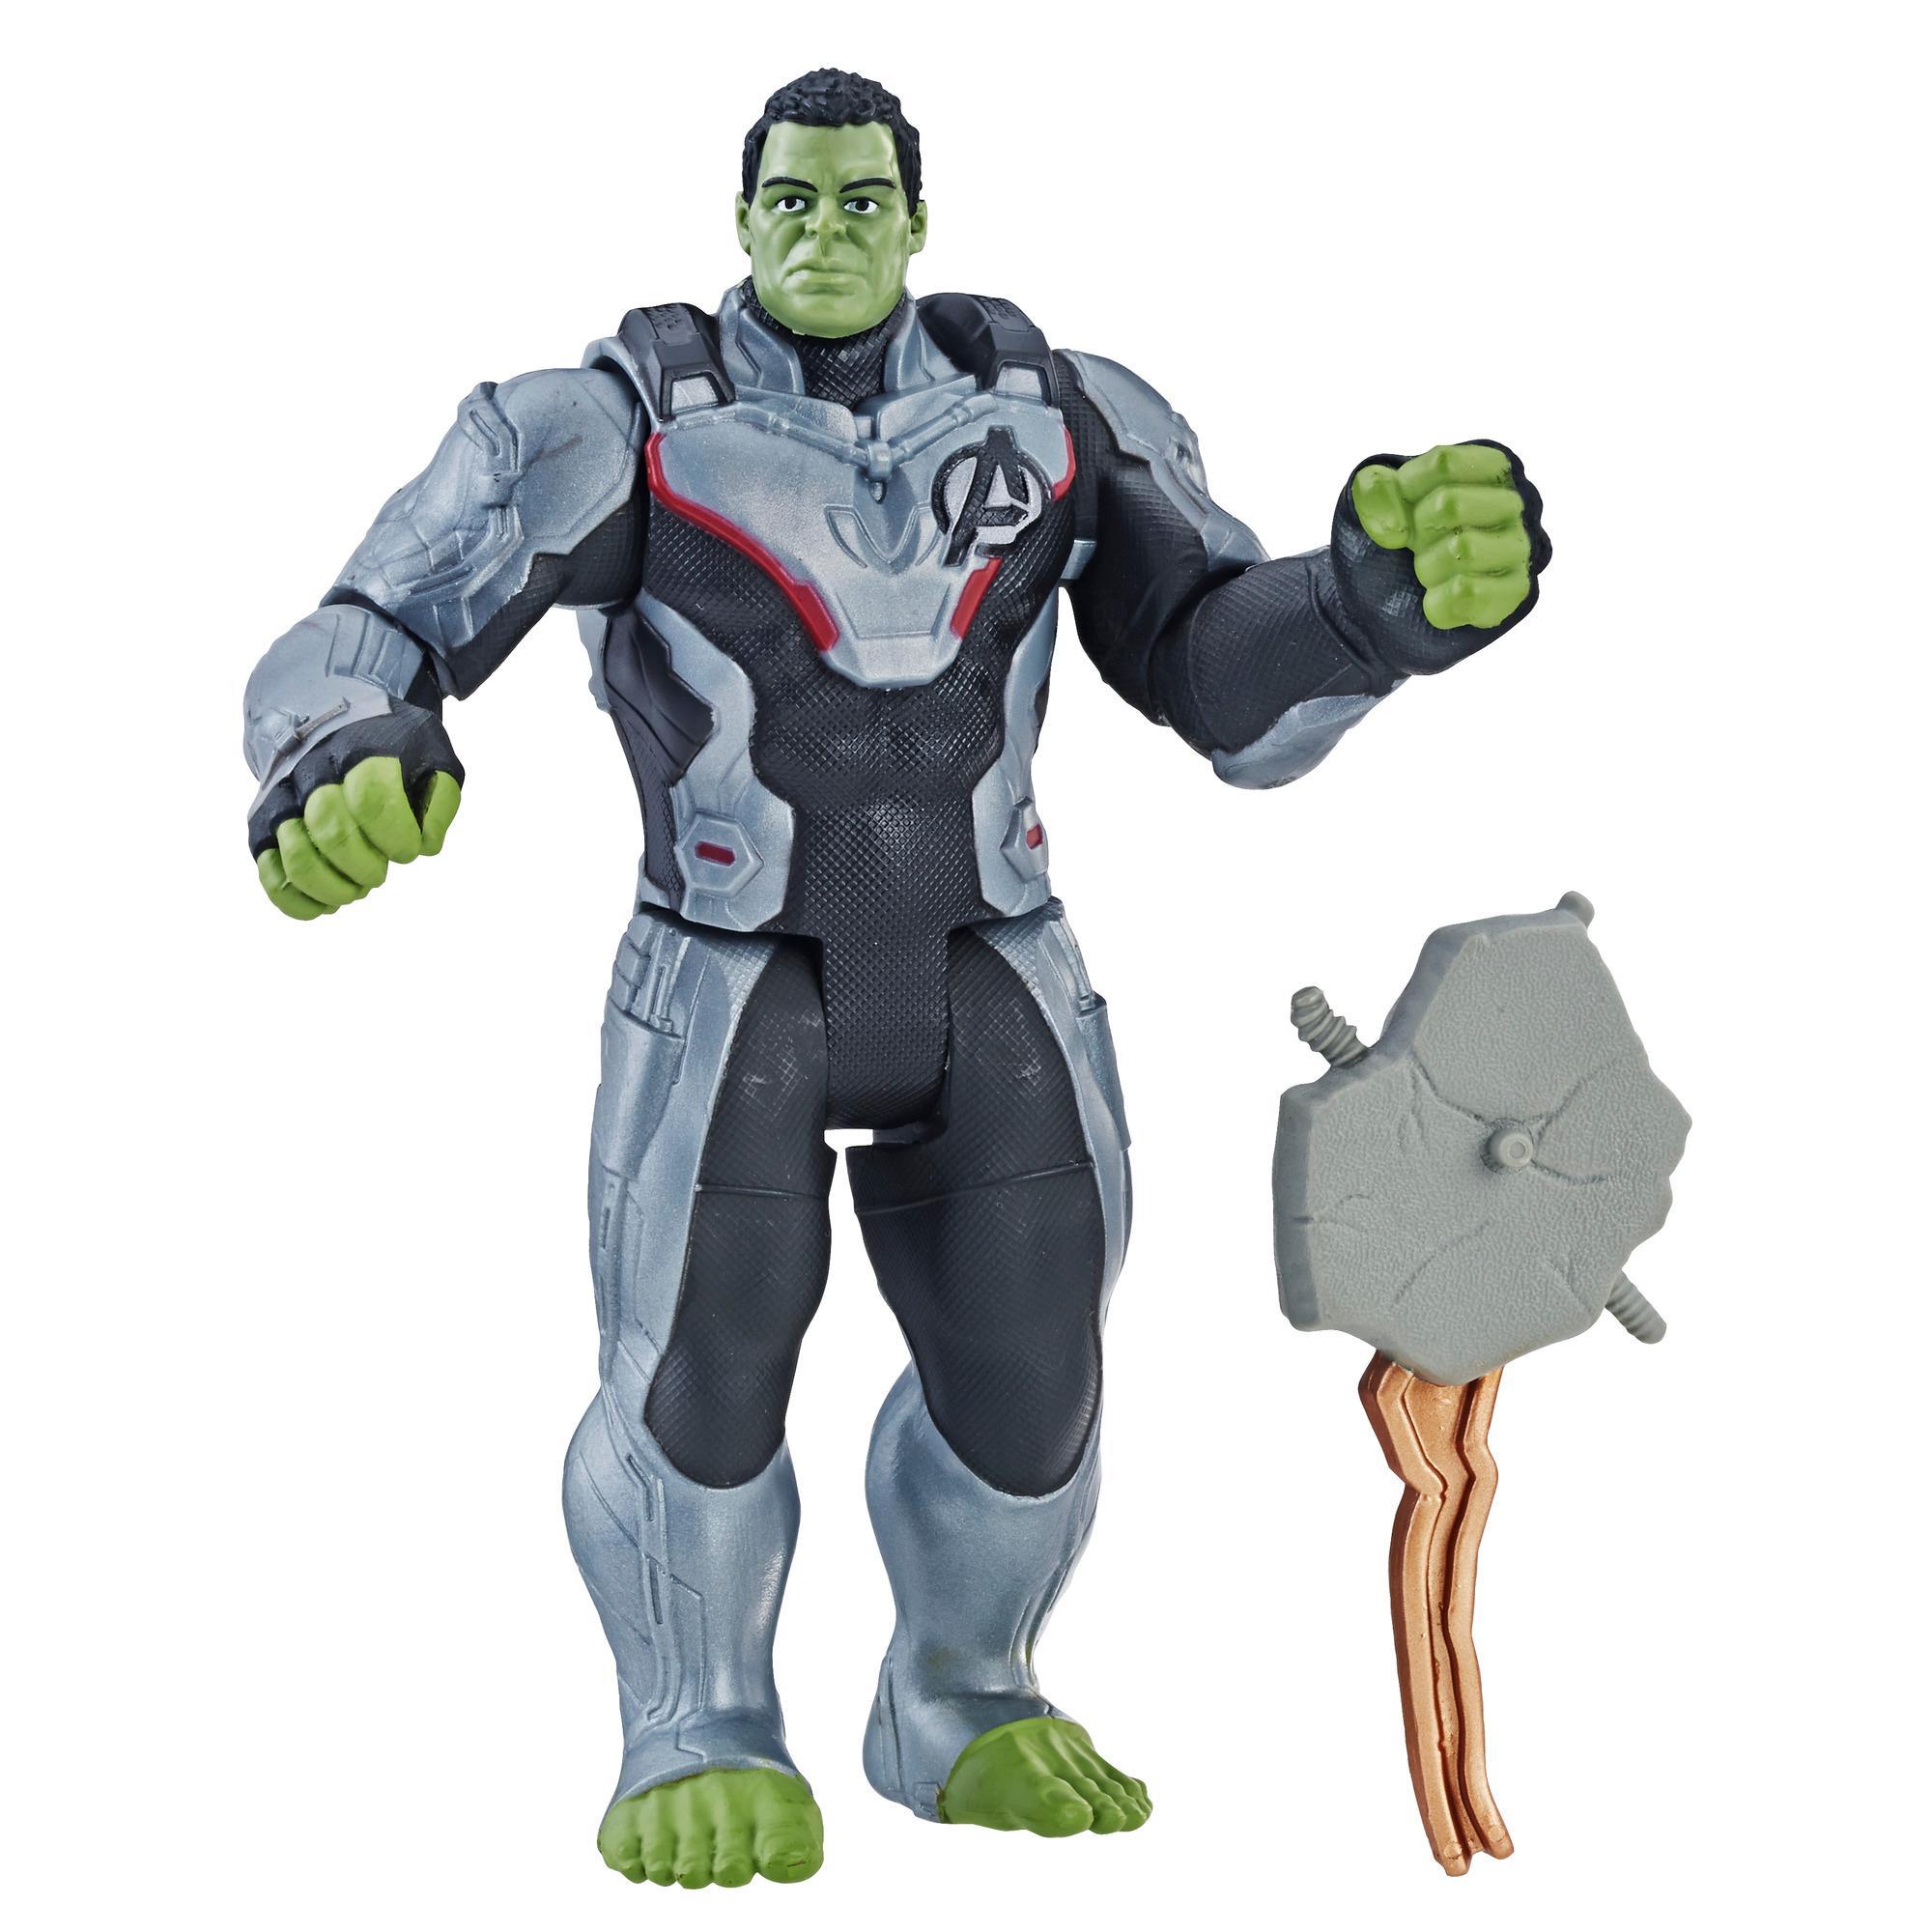 Marvel Avengers: Endgame - Hulk con accessorio(Action Figure, 15 cm)